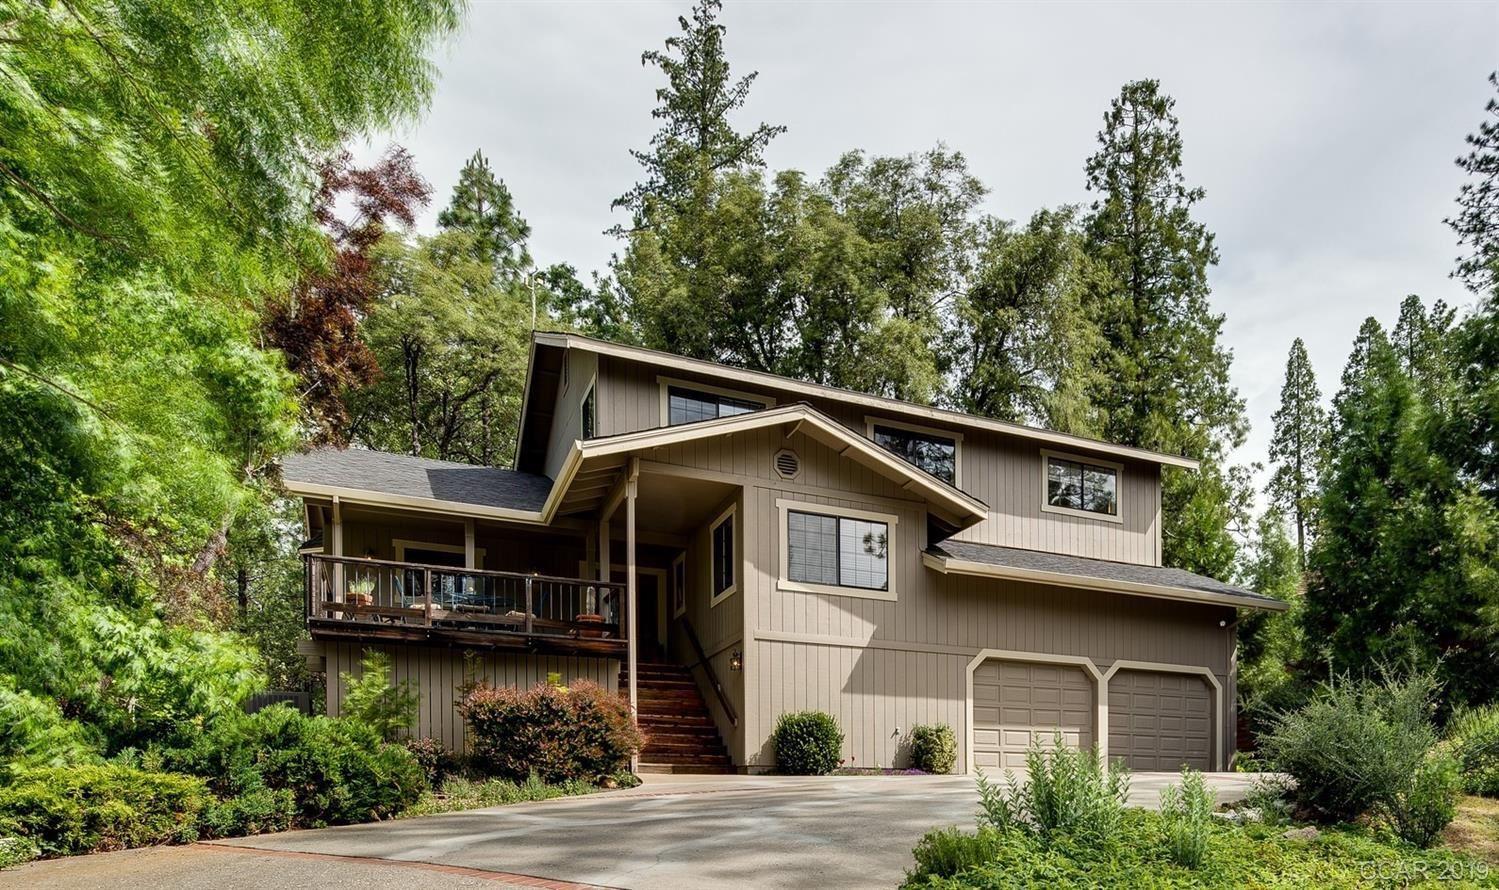 1010 Forest Meadows Drive, Murphys, CA 95247 - MLS#: 2000750